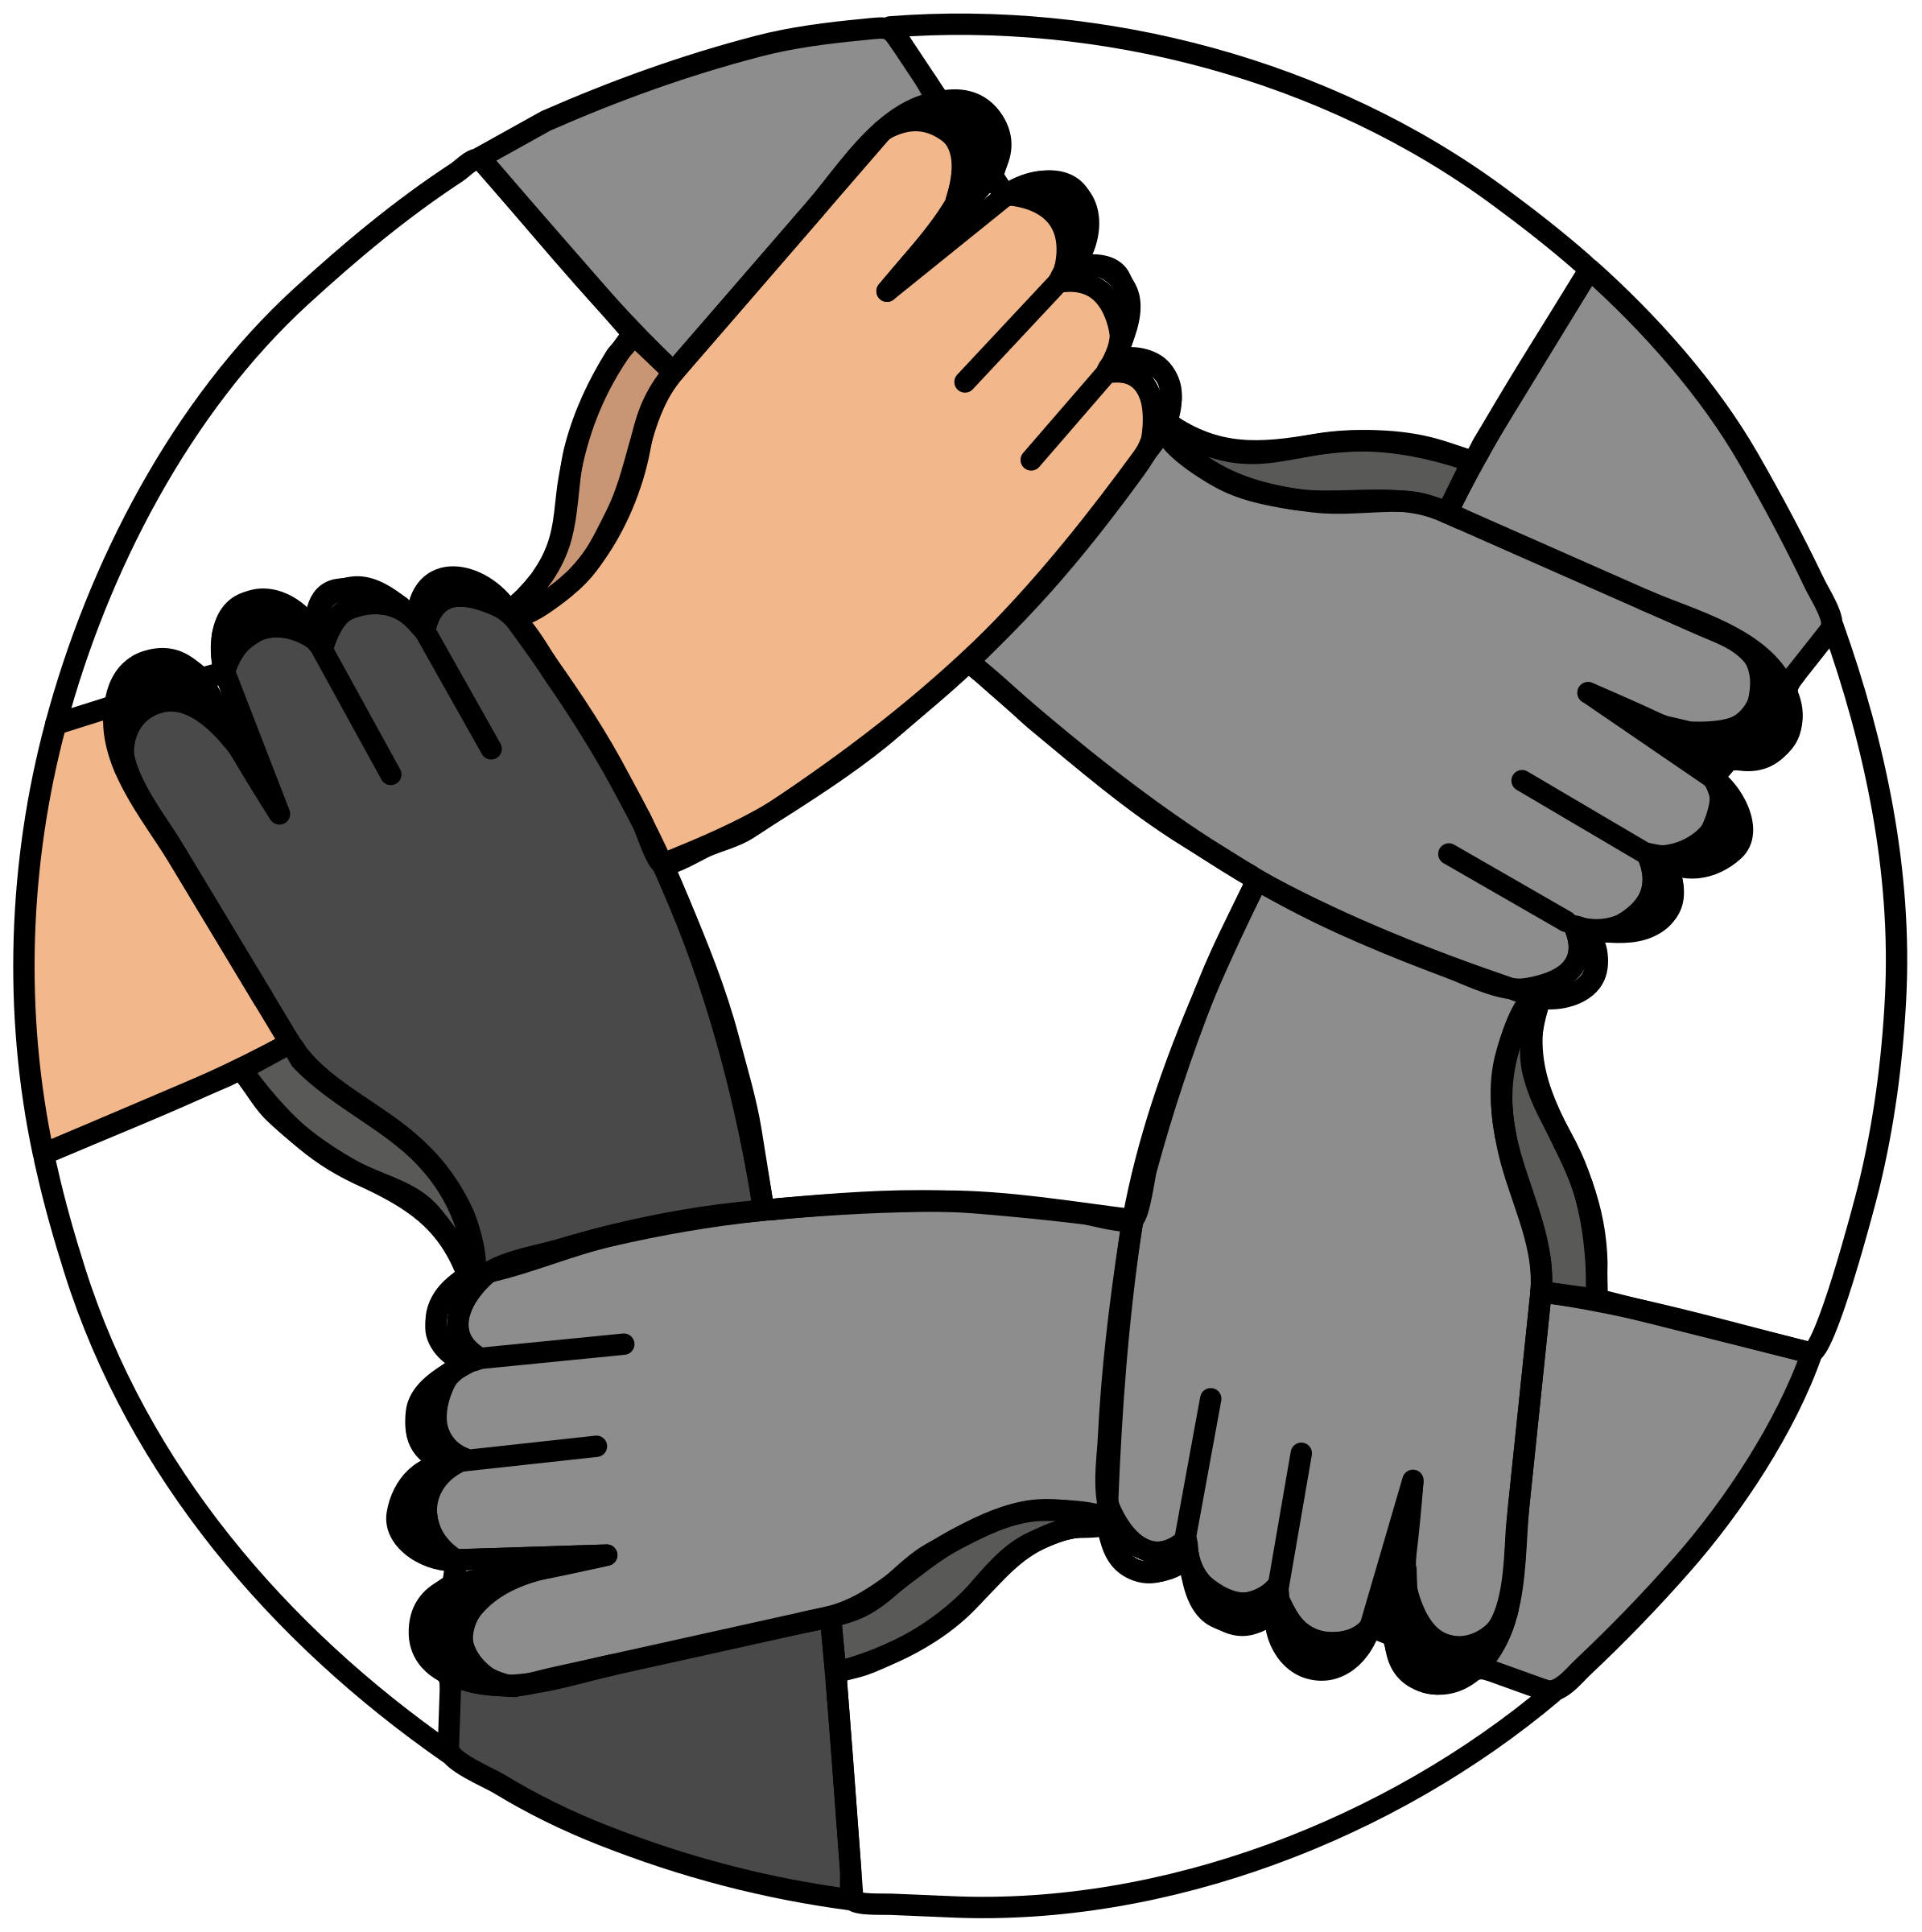 Hands united big image. Finger clipart hand foot